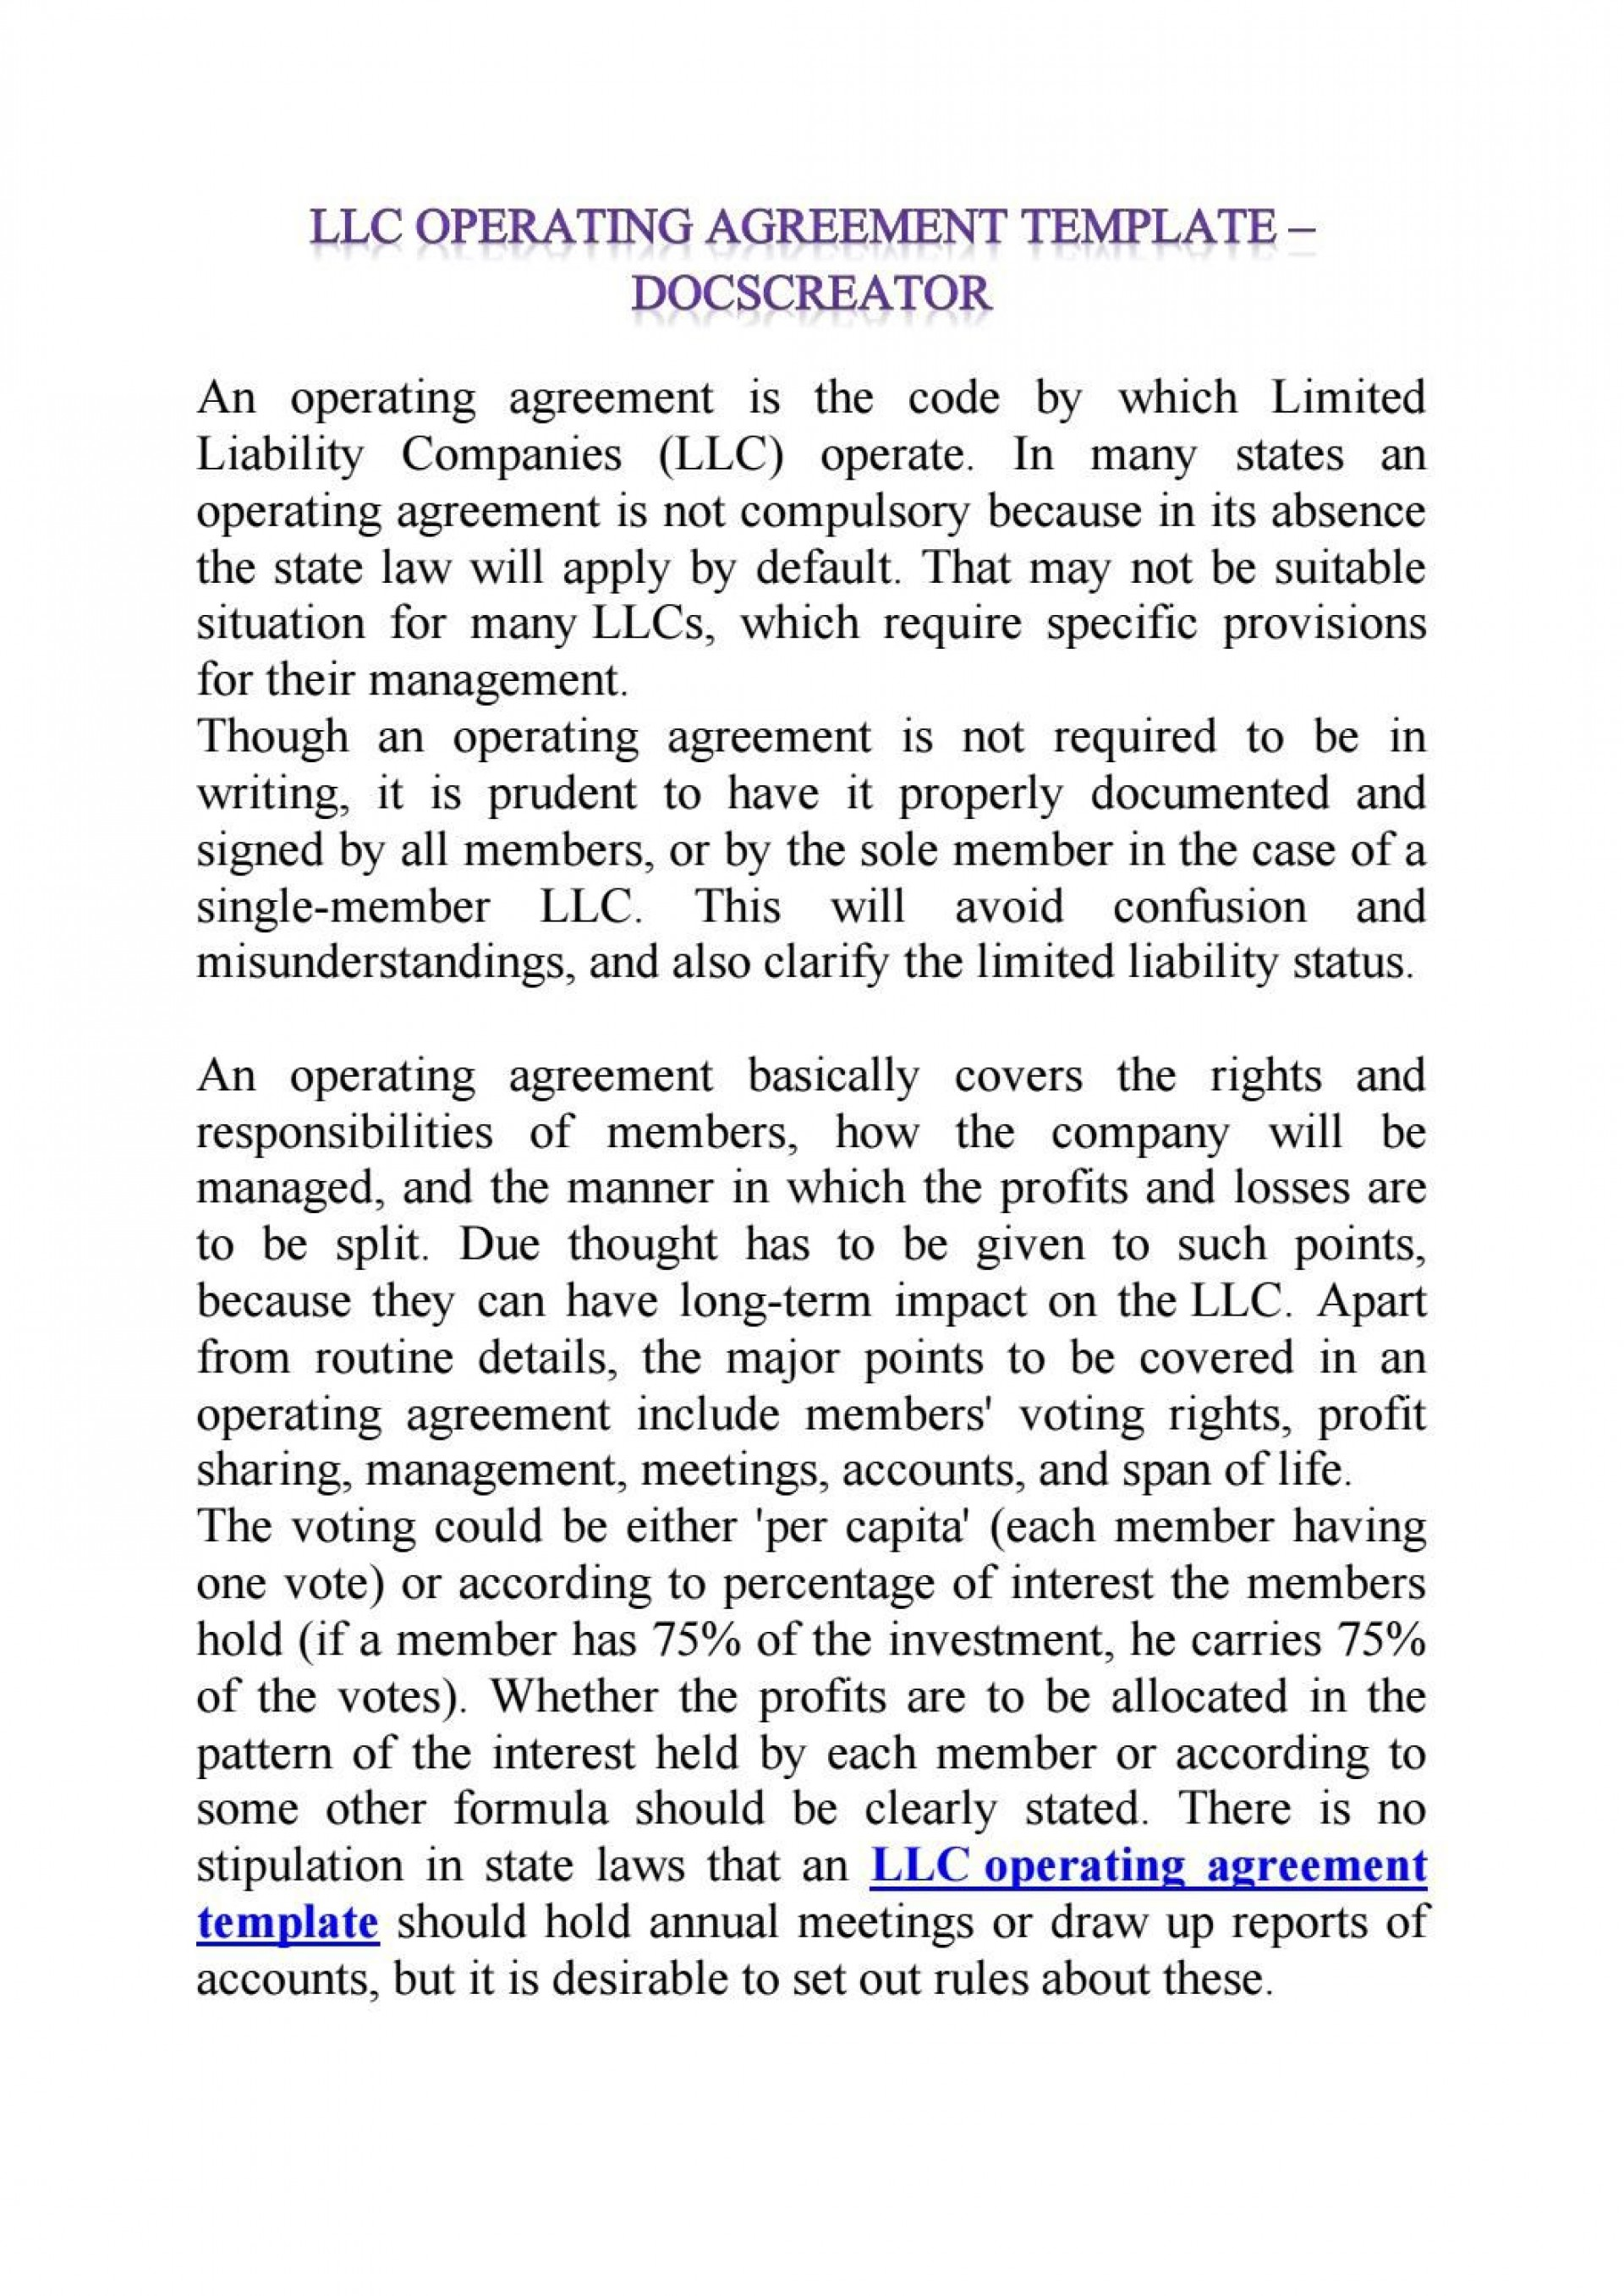 008 Simple Operation Agreement Llc Template Example  Operating Florida Indiana Single Member California1920